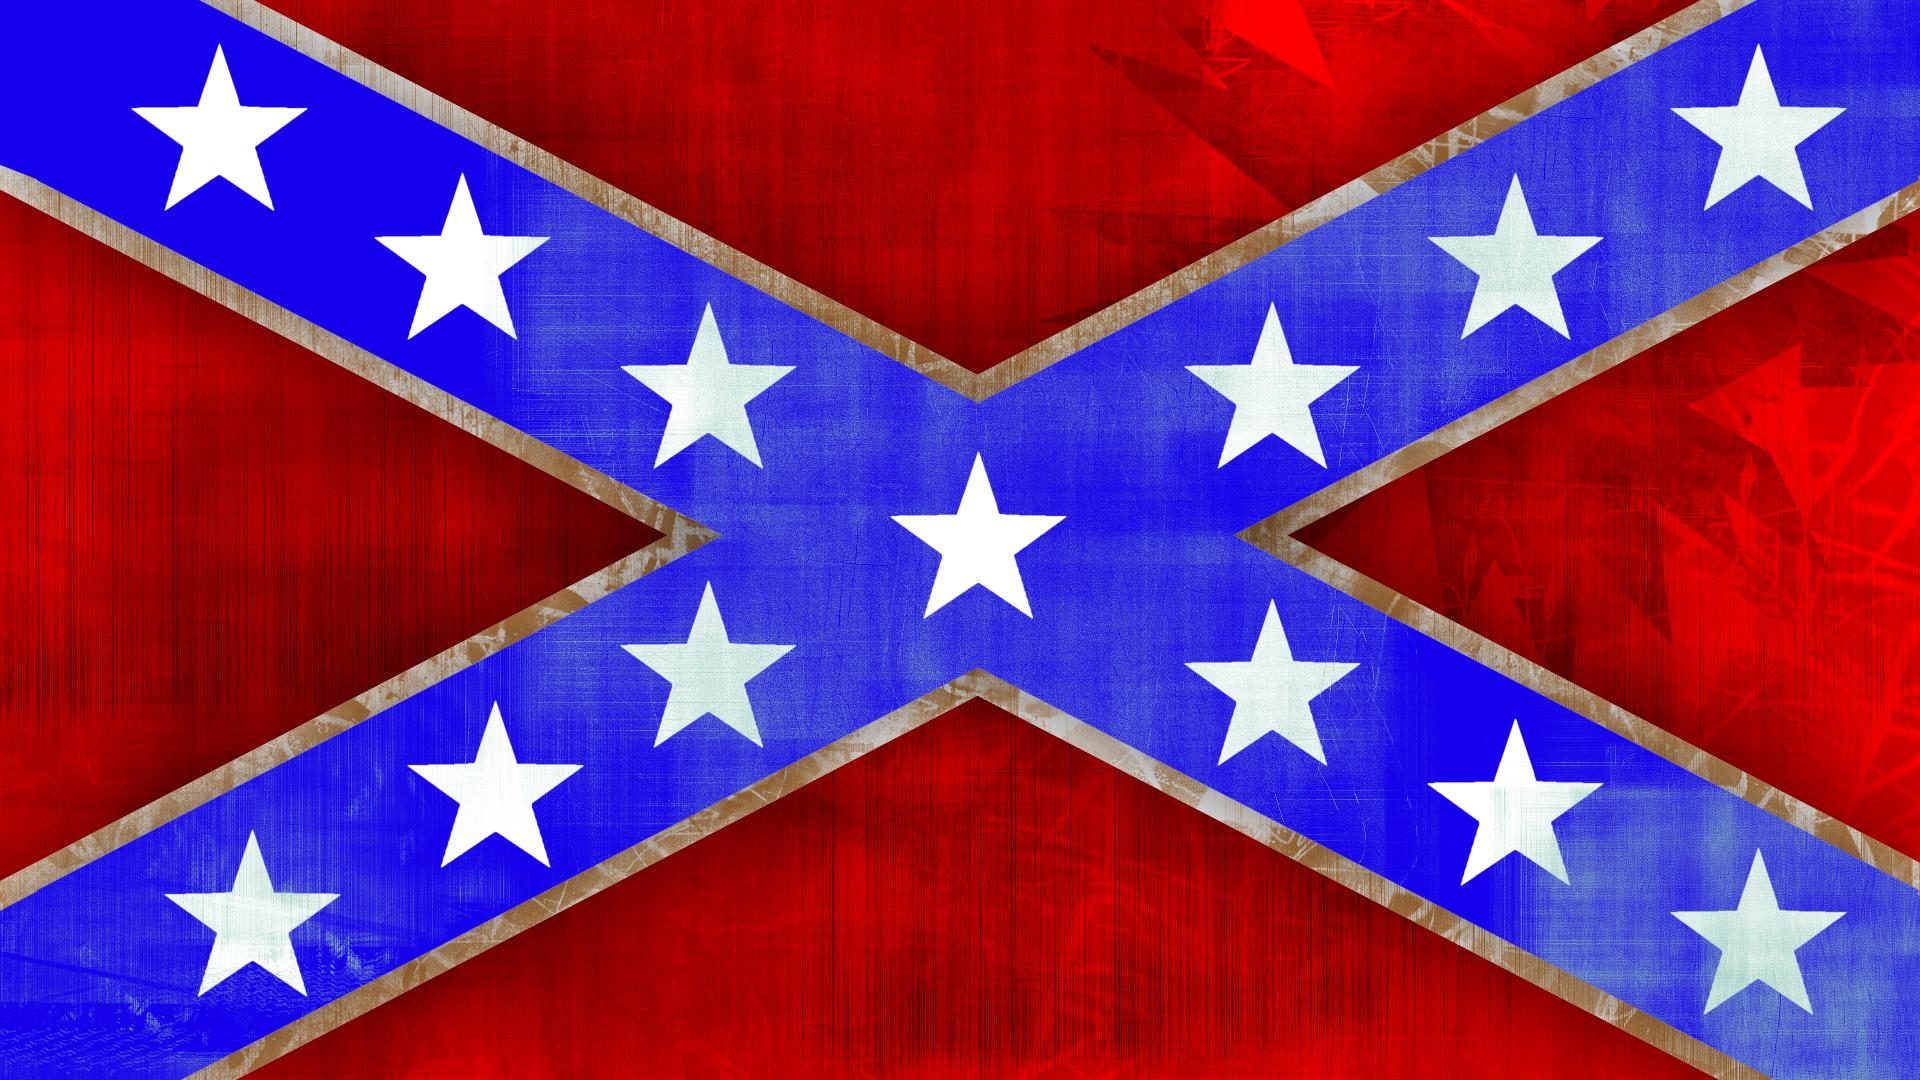 Confederate Flag W Grunge 1920x1280 by RandomPancake420 on deviantART 1920x1080